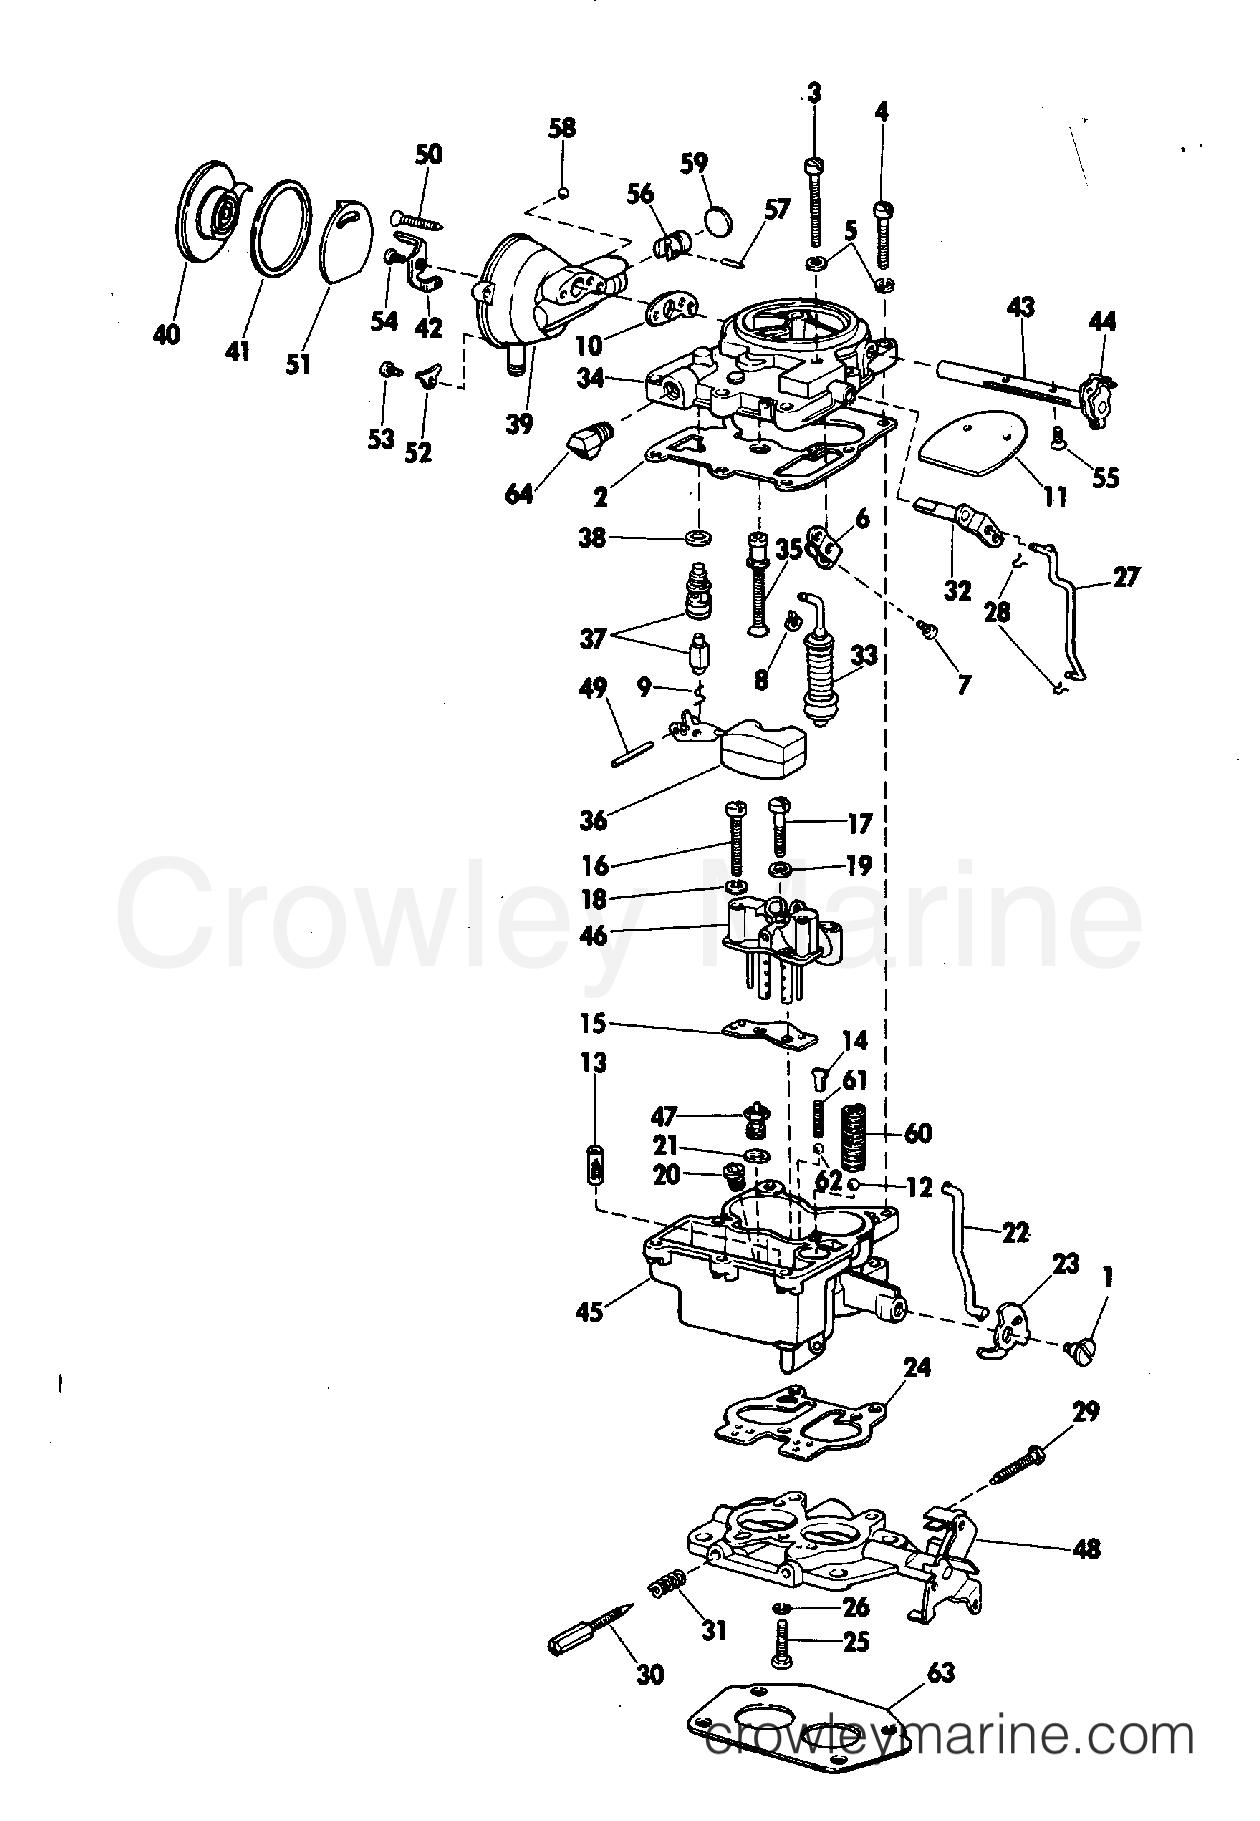 1969 OMC Stern Drive 80 - NUE-10S - CARBURETOR GROUP 80, 155 HP